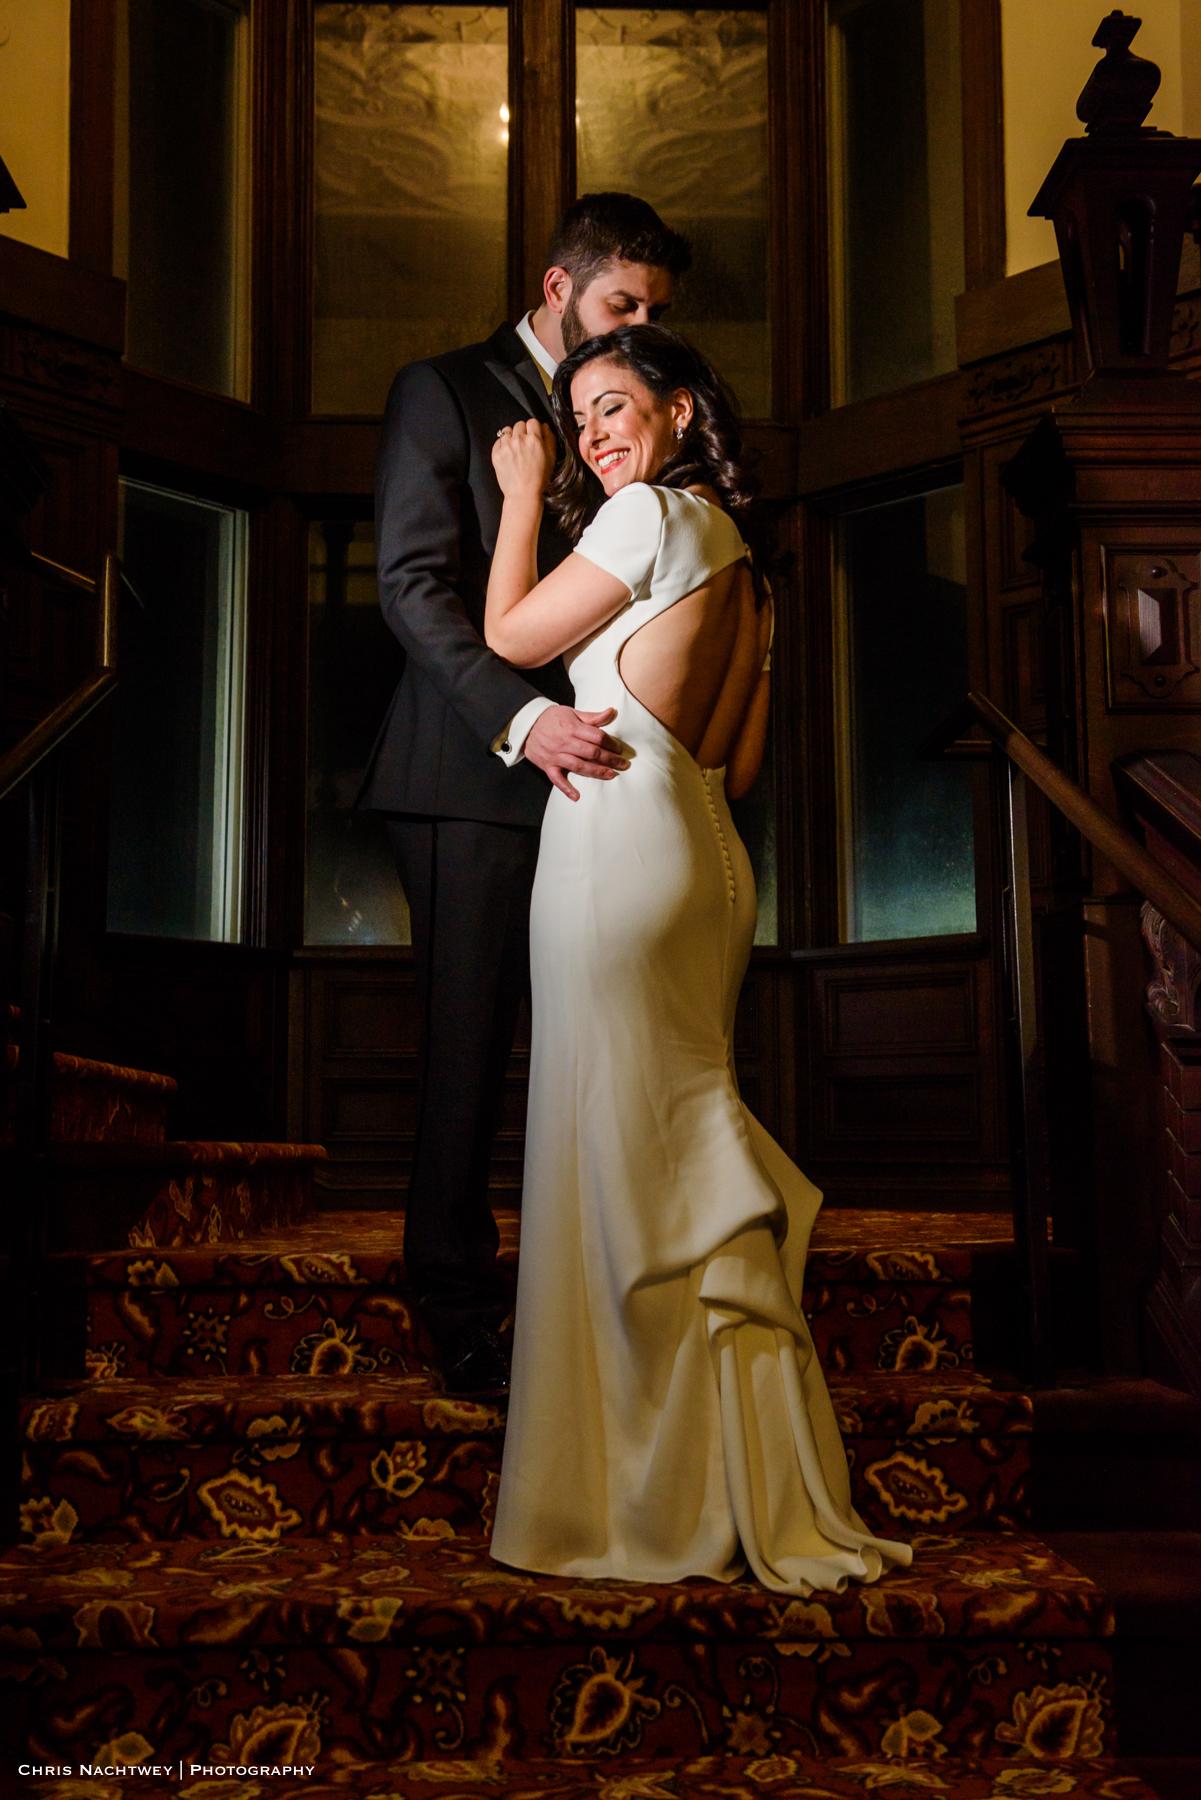 winter-branford-house-wedding-photos-groton-ct-chris-nachtwey-photography-2019-39.jpg